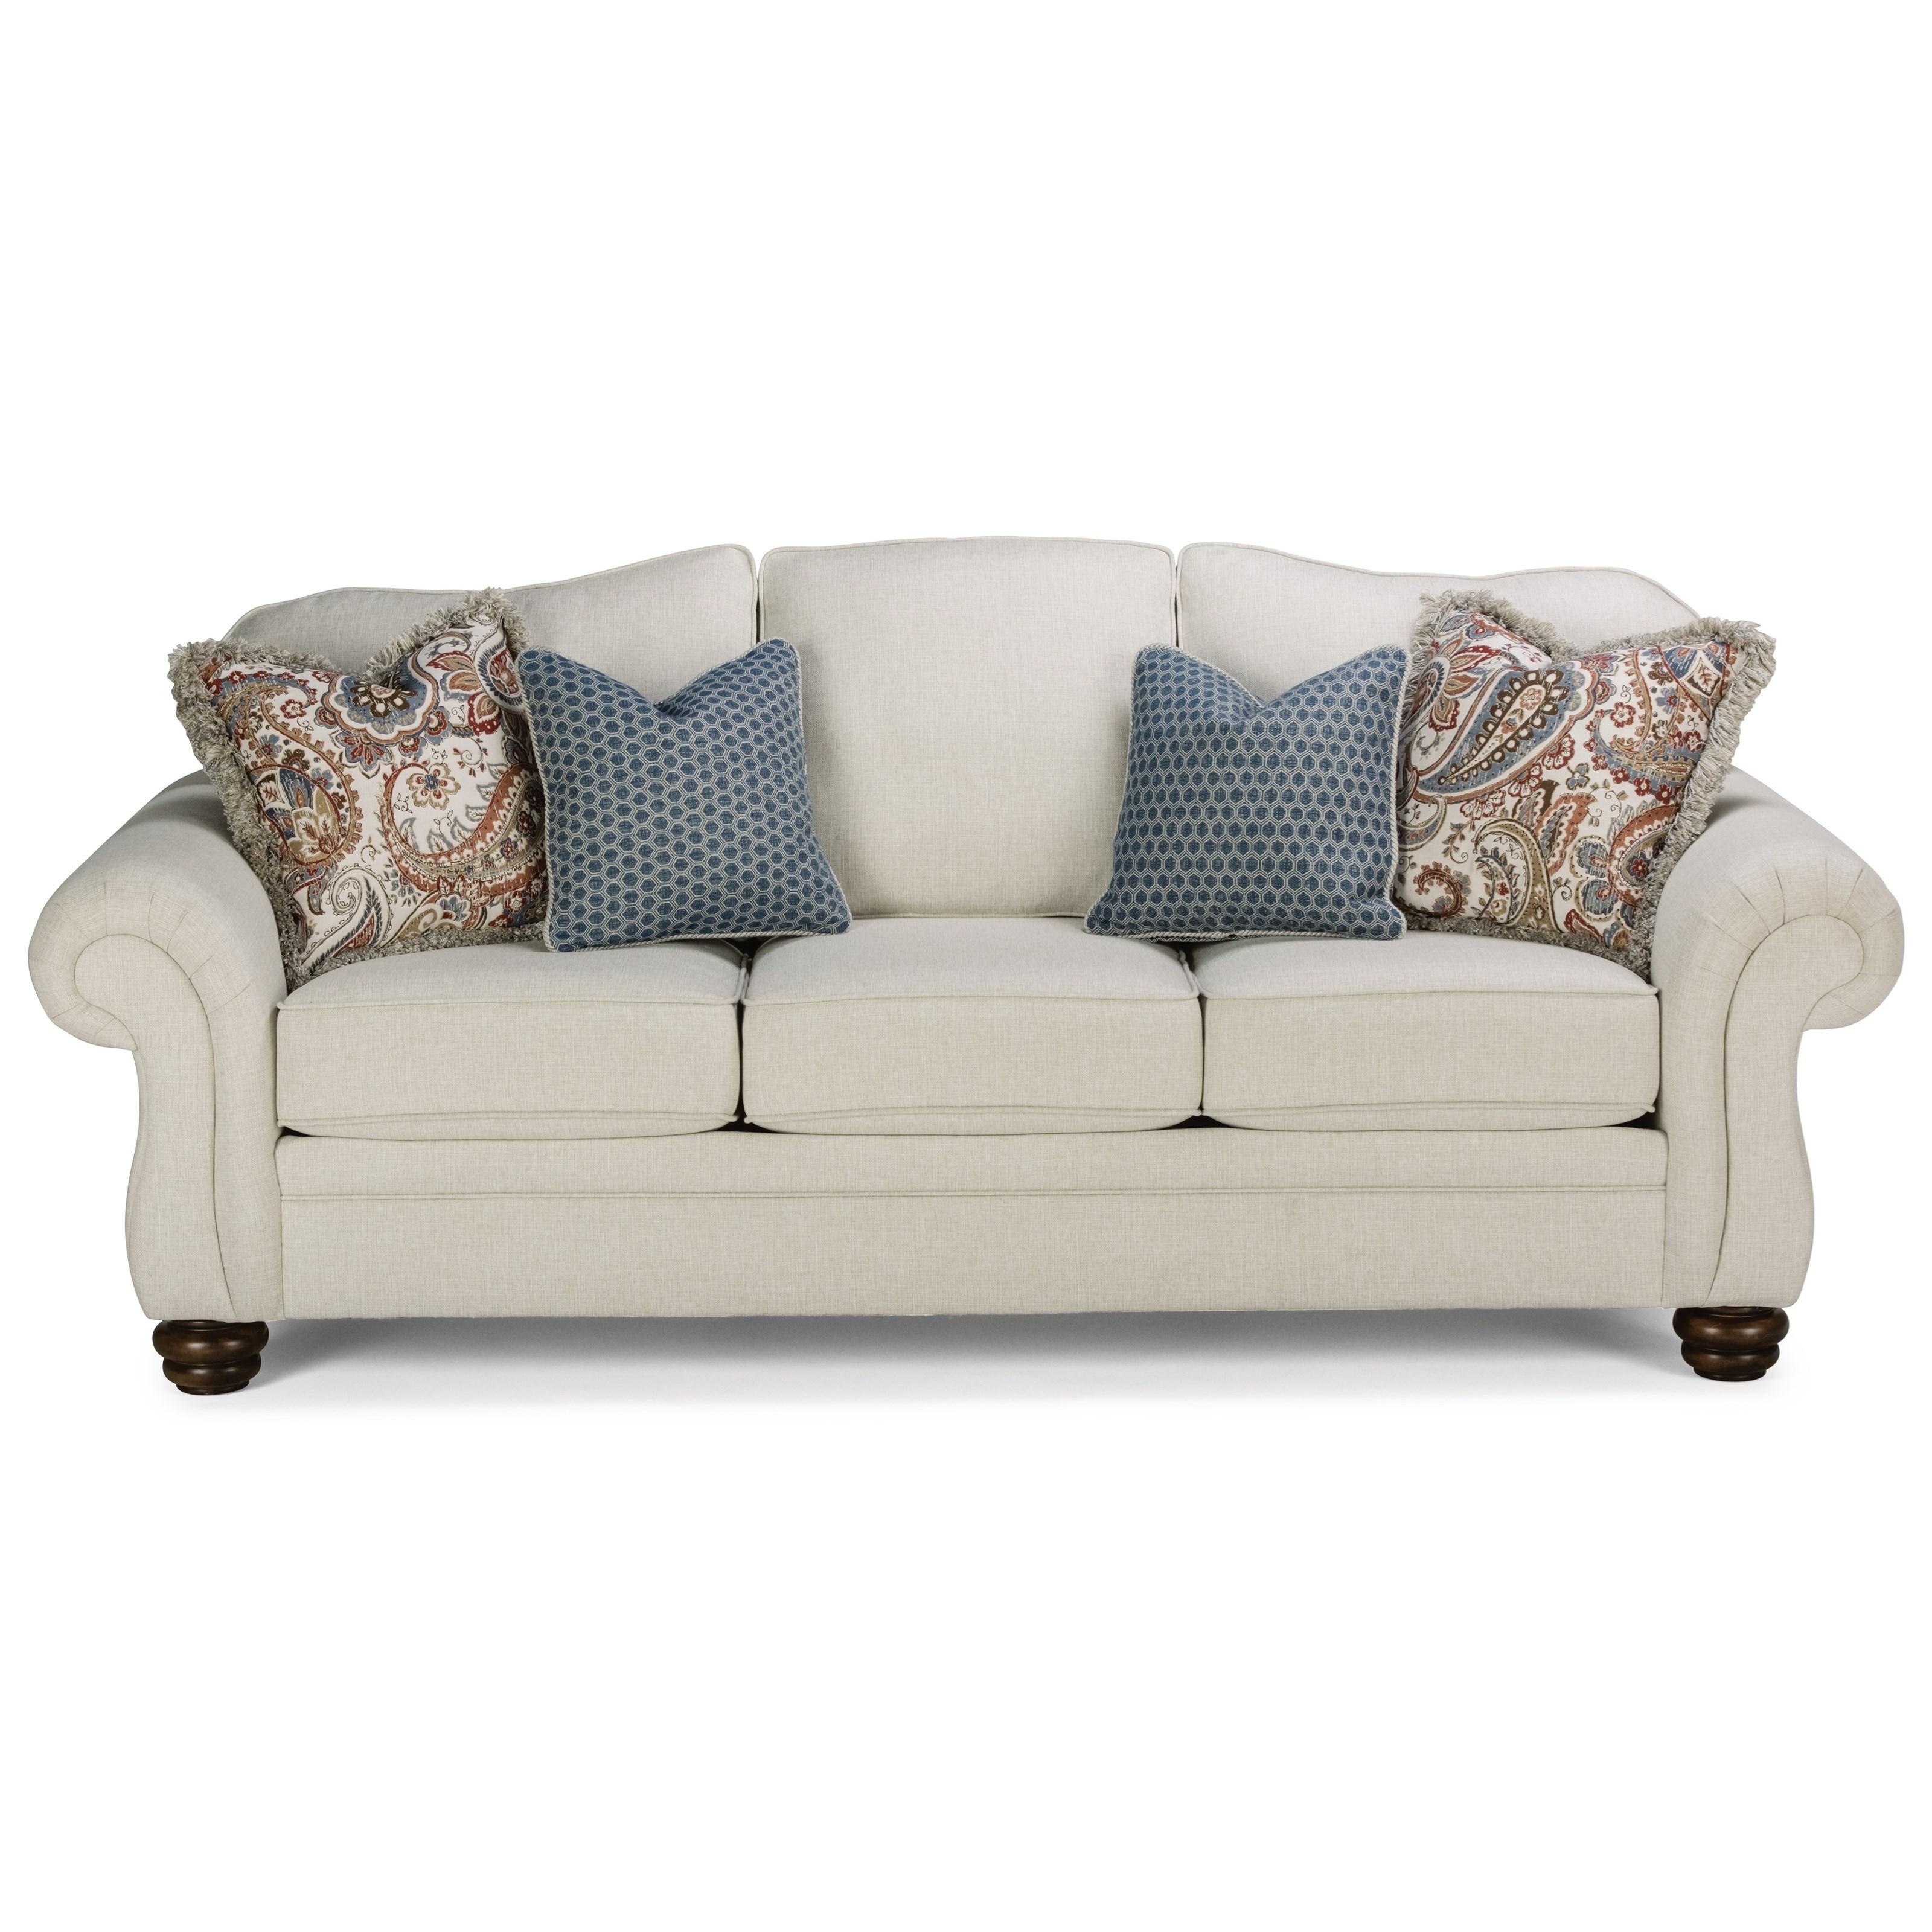 Wymore Sofa  by Flexsteel at Crowley Furniture & Mattress